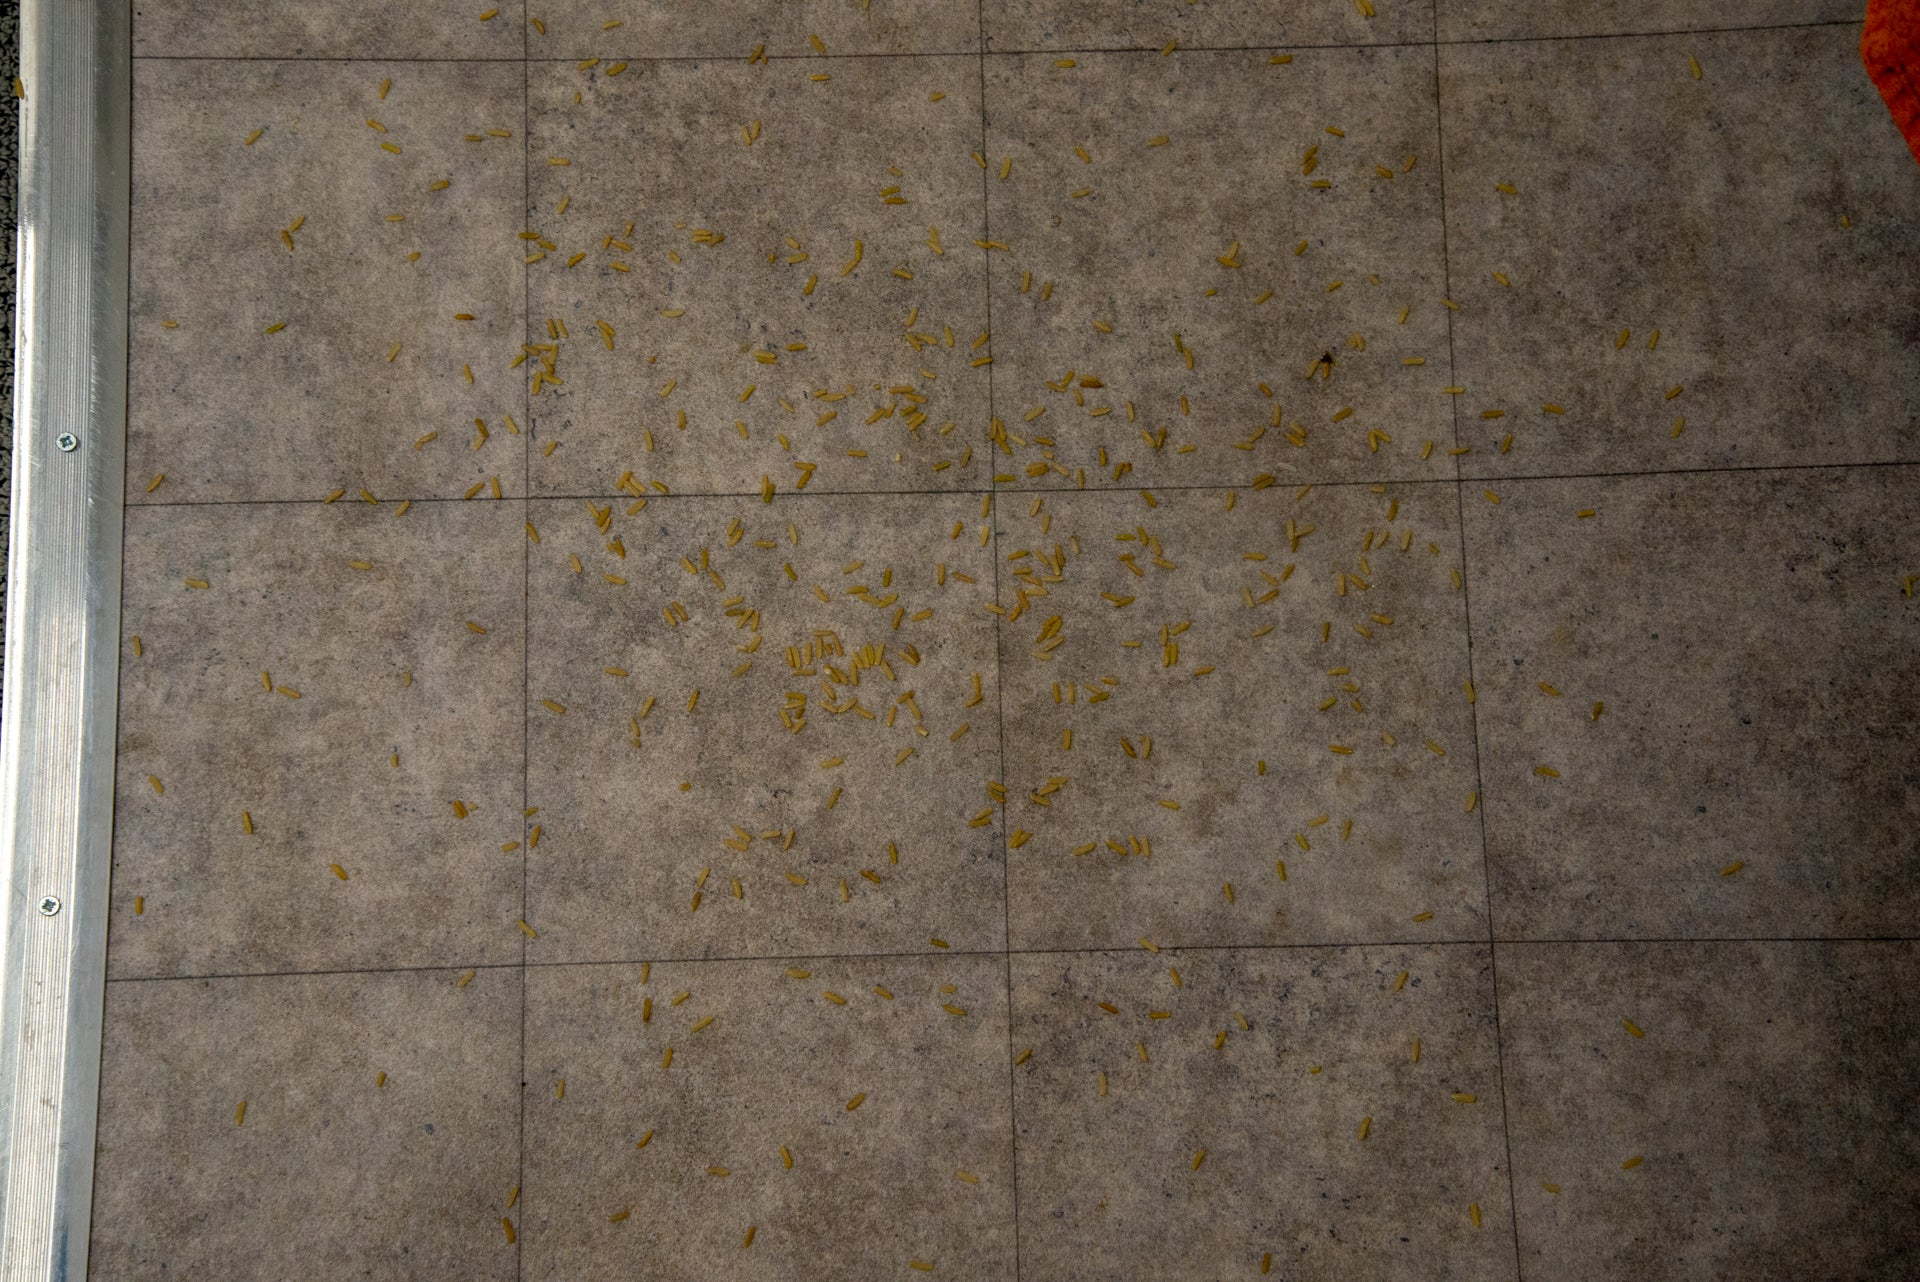 Ultenic U11 dirty hard floor